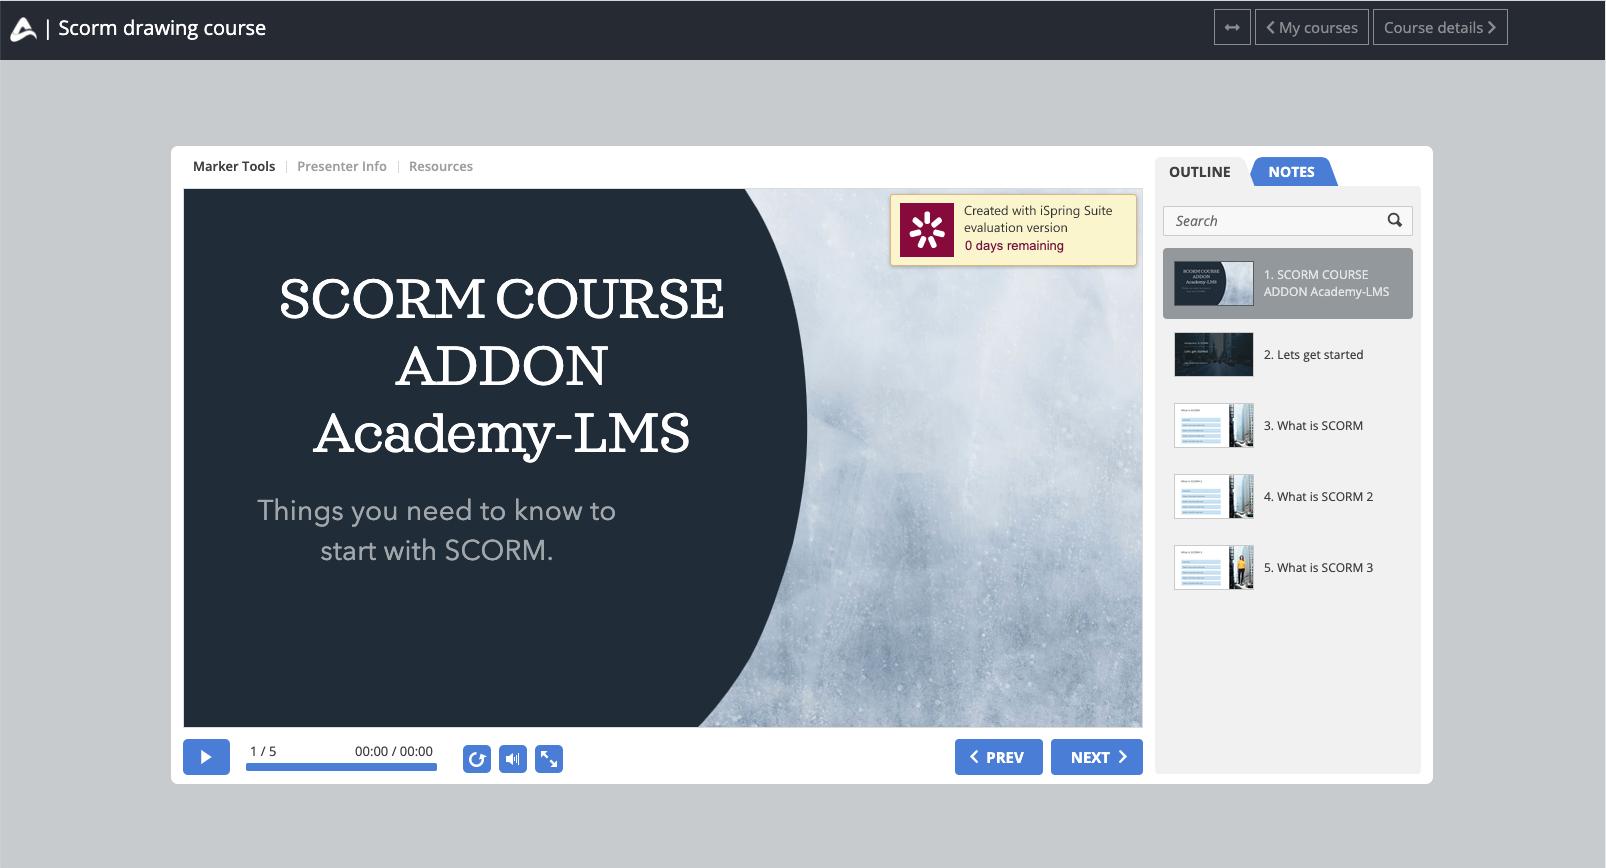 Academy LMS Scorm Course Addon - 1